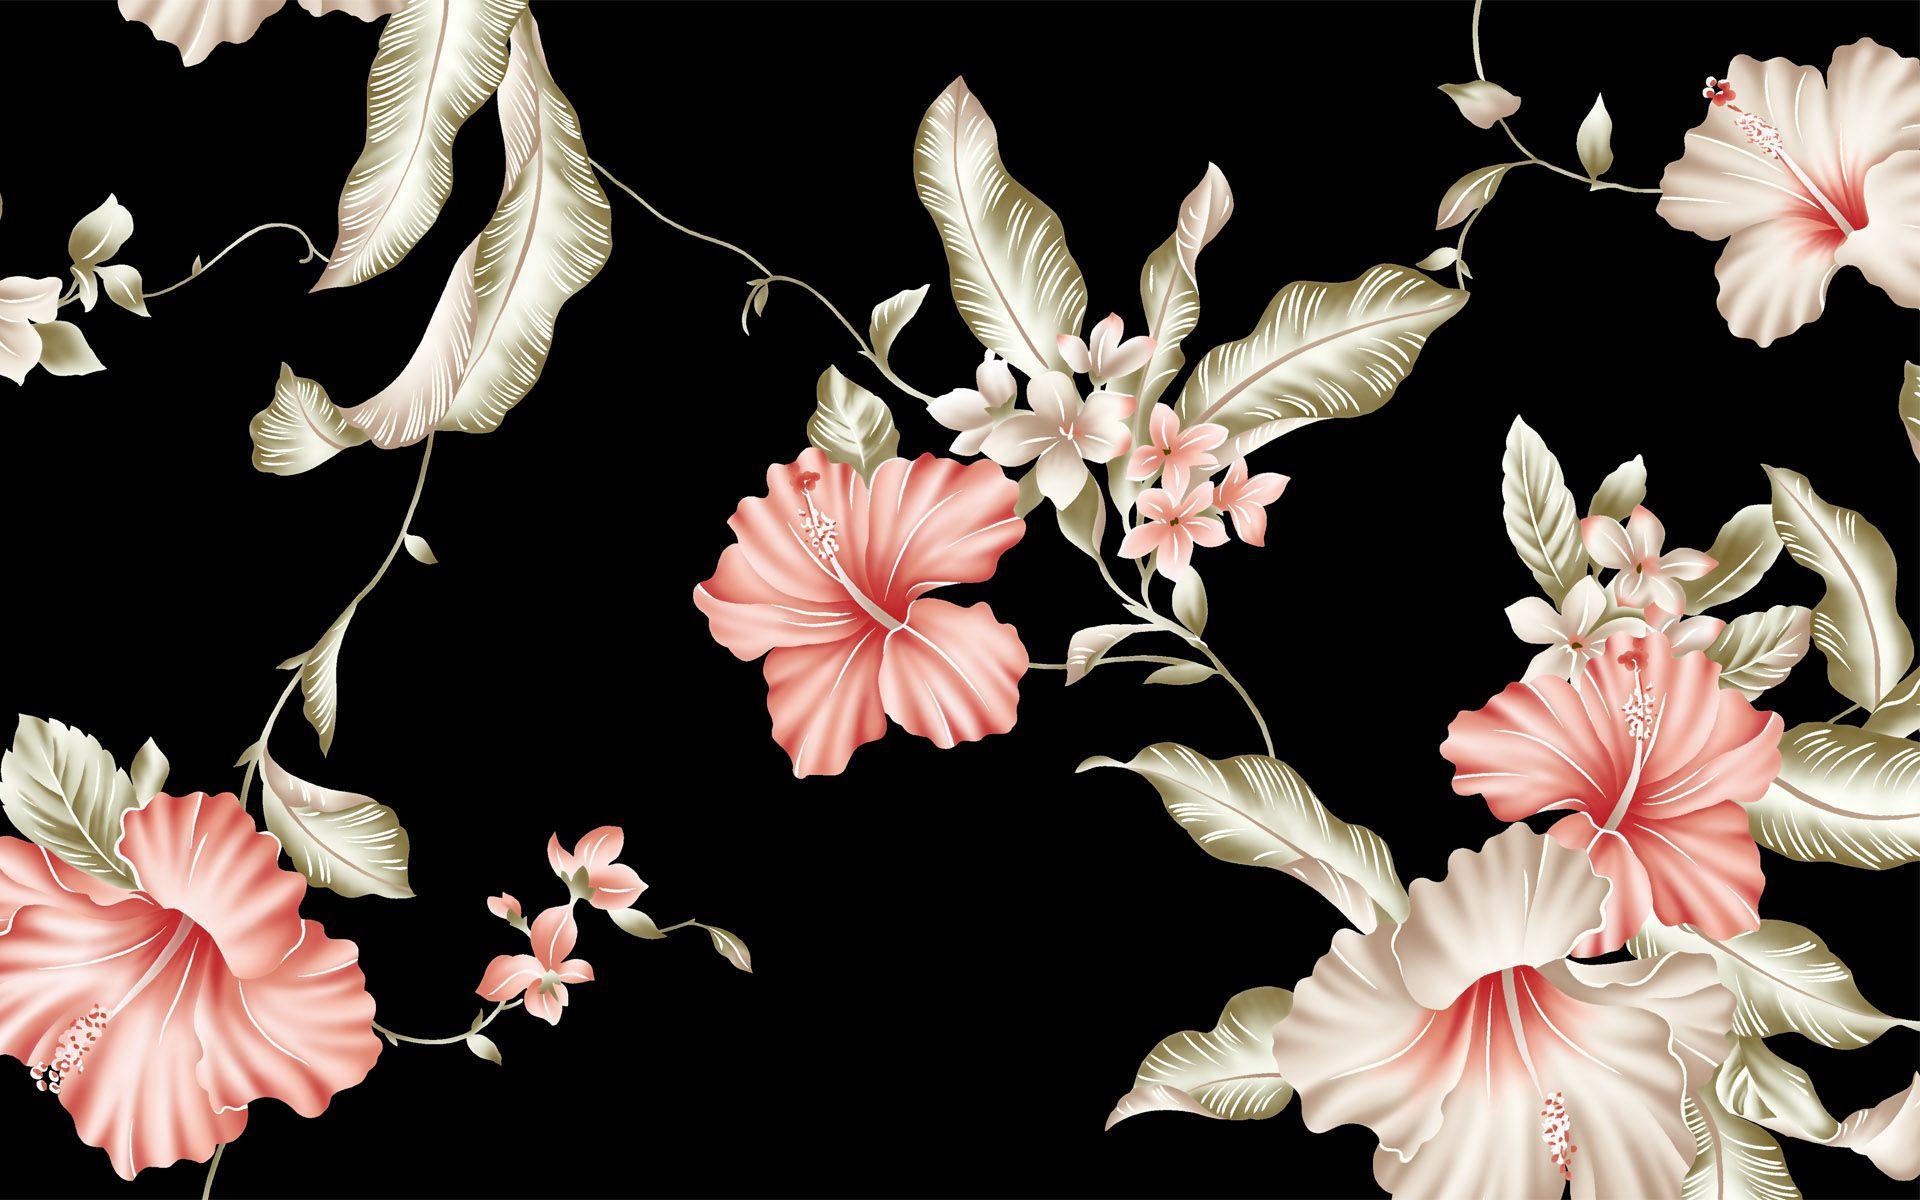 Hibiscus Flowers Wallpaper 1920x1200 Px